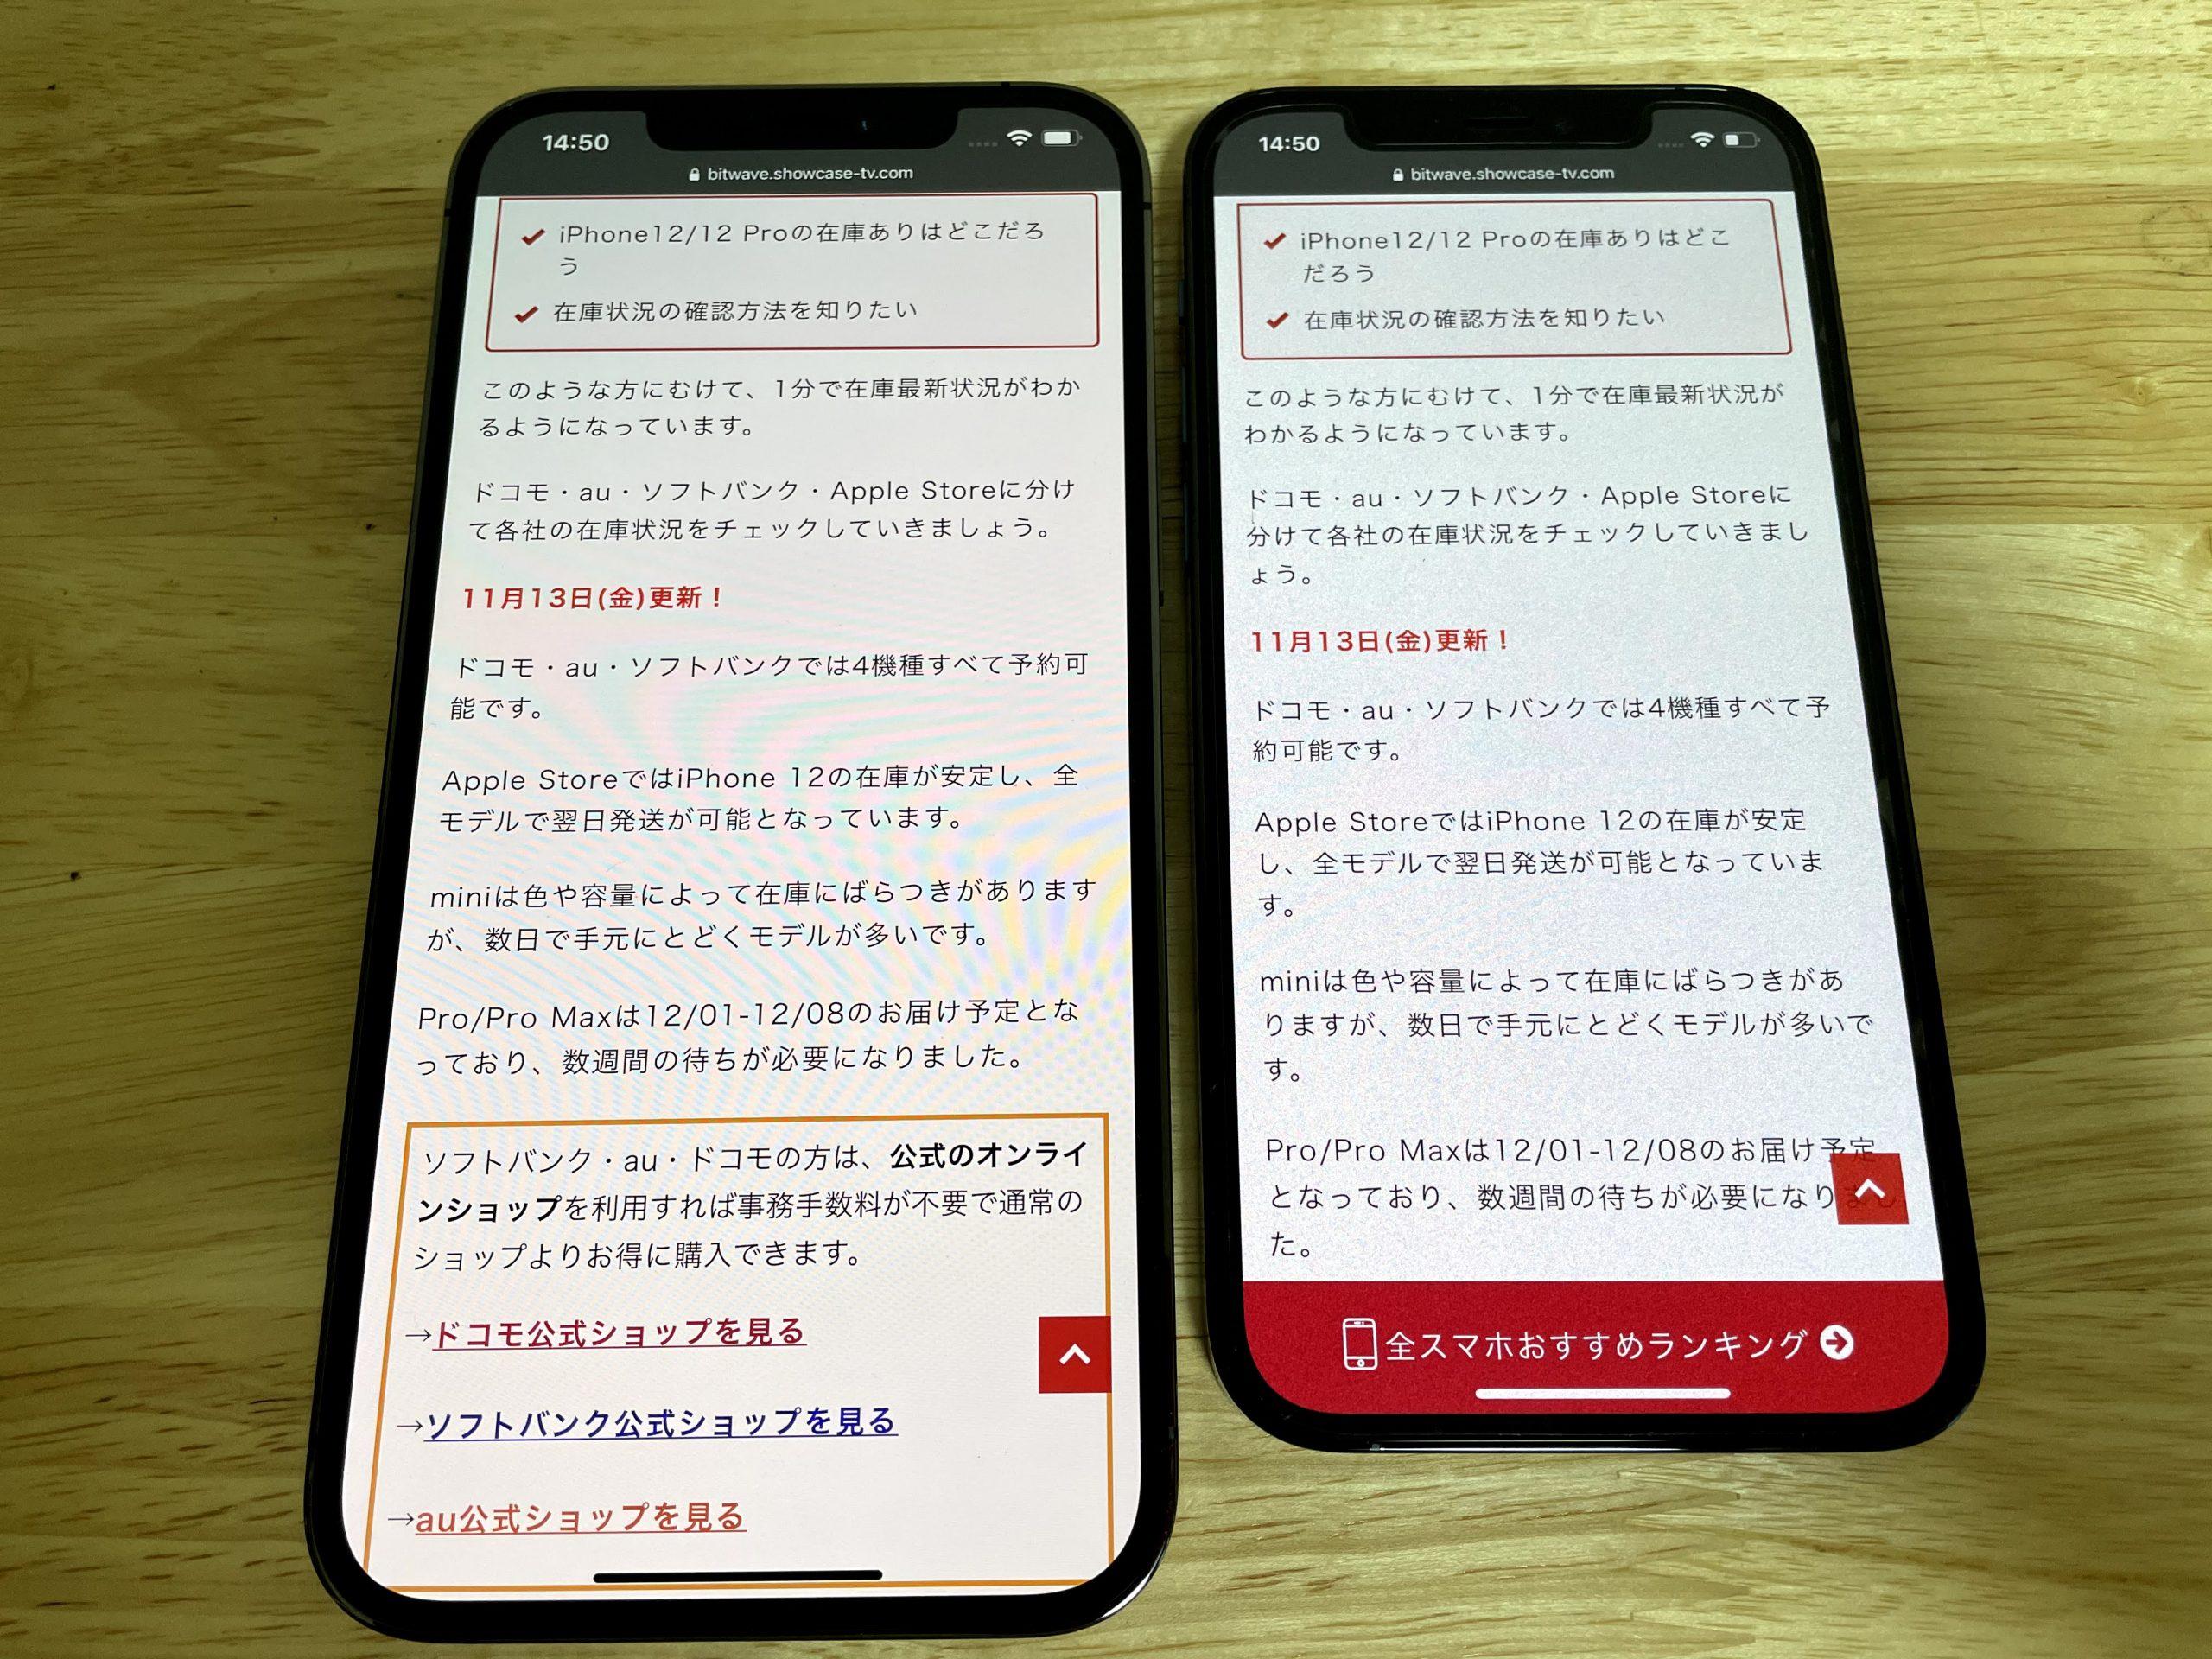 iPhone 12 Pro Max 実機レビュー14